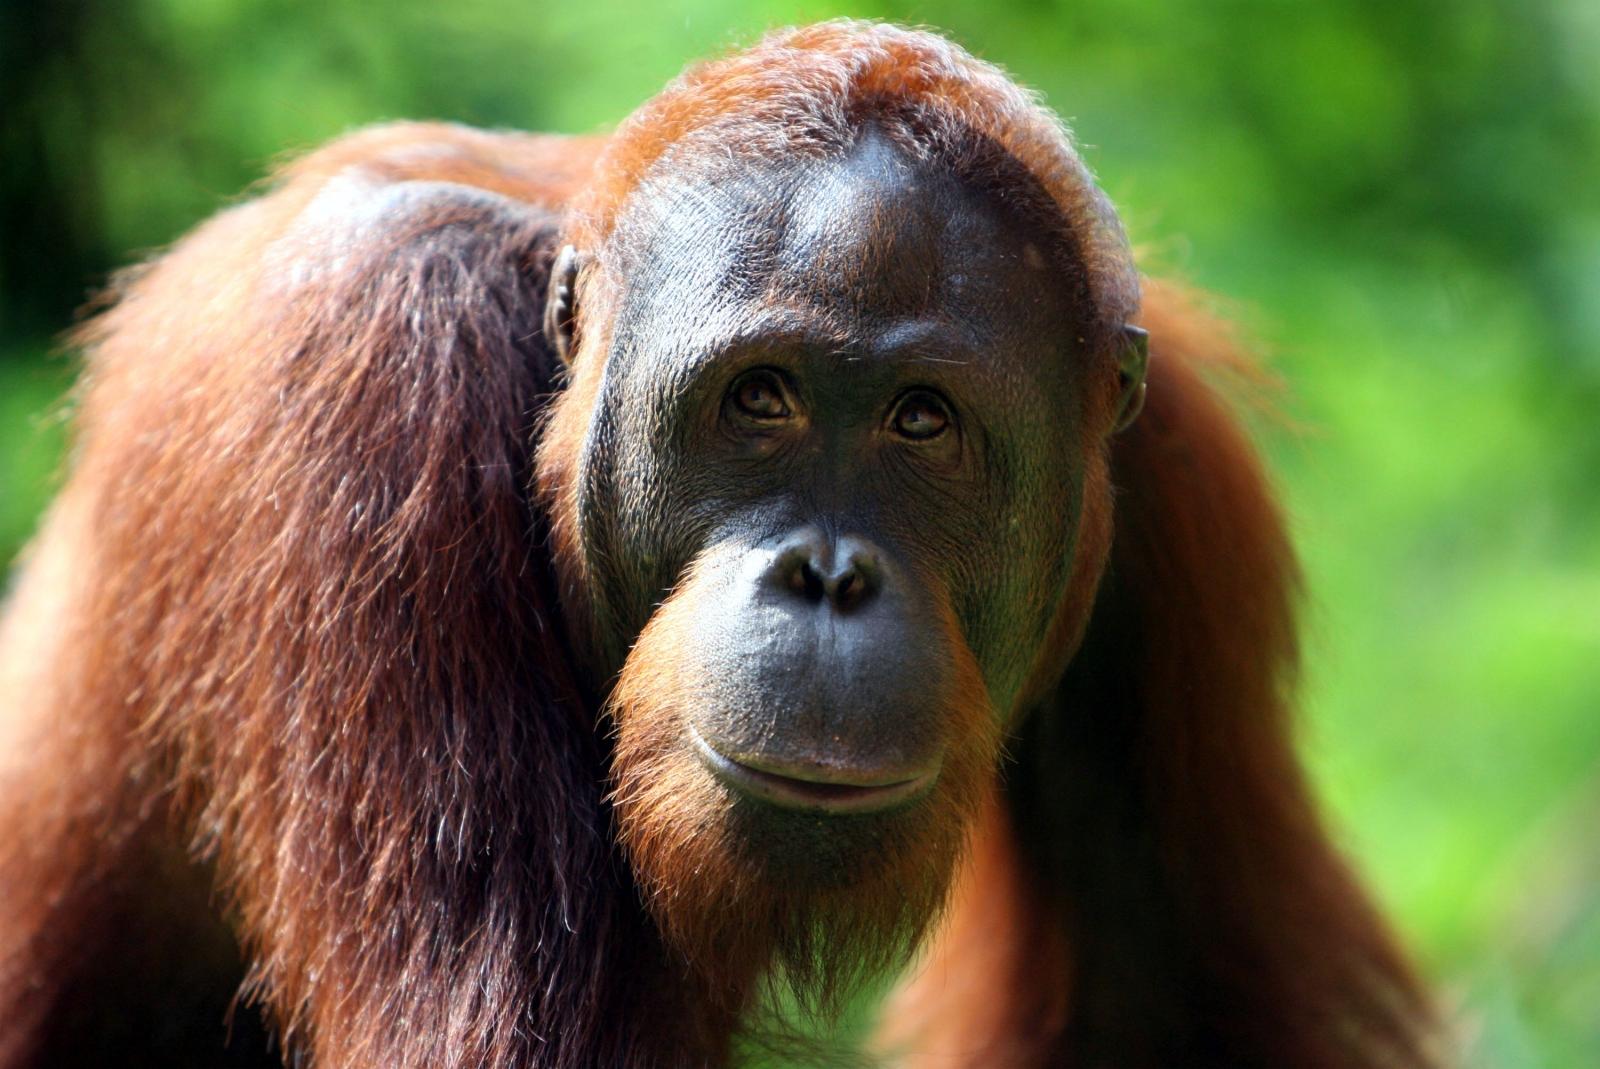 Zoos Victoria orangutan to get video games